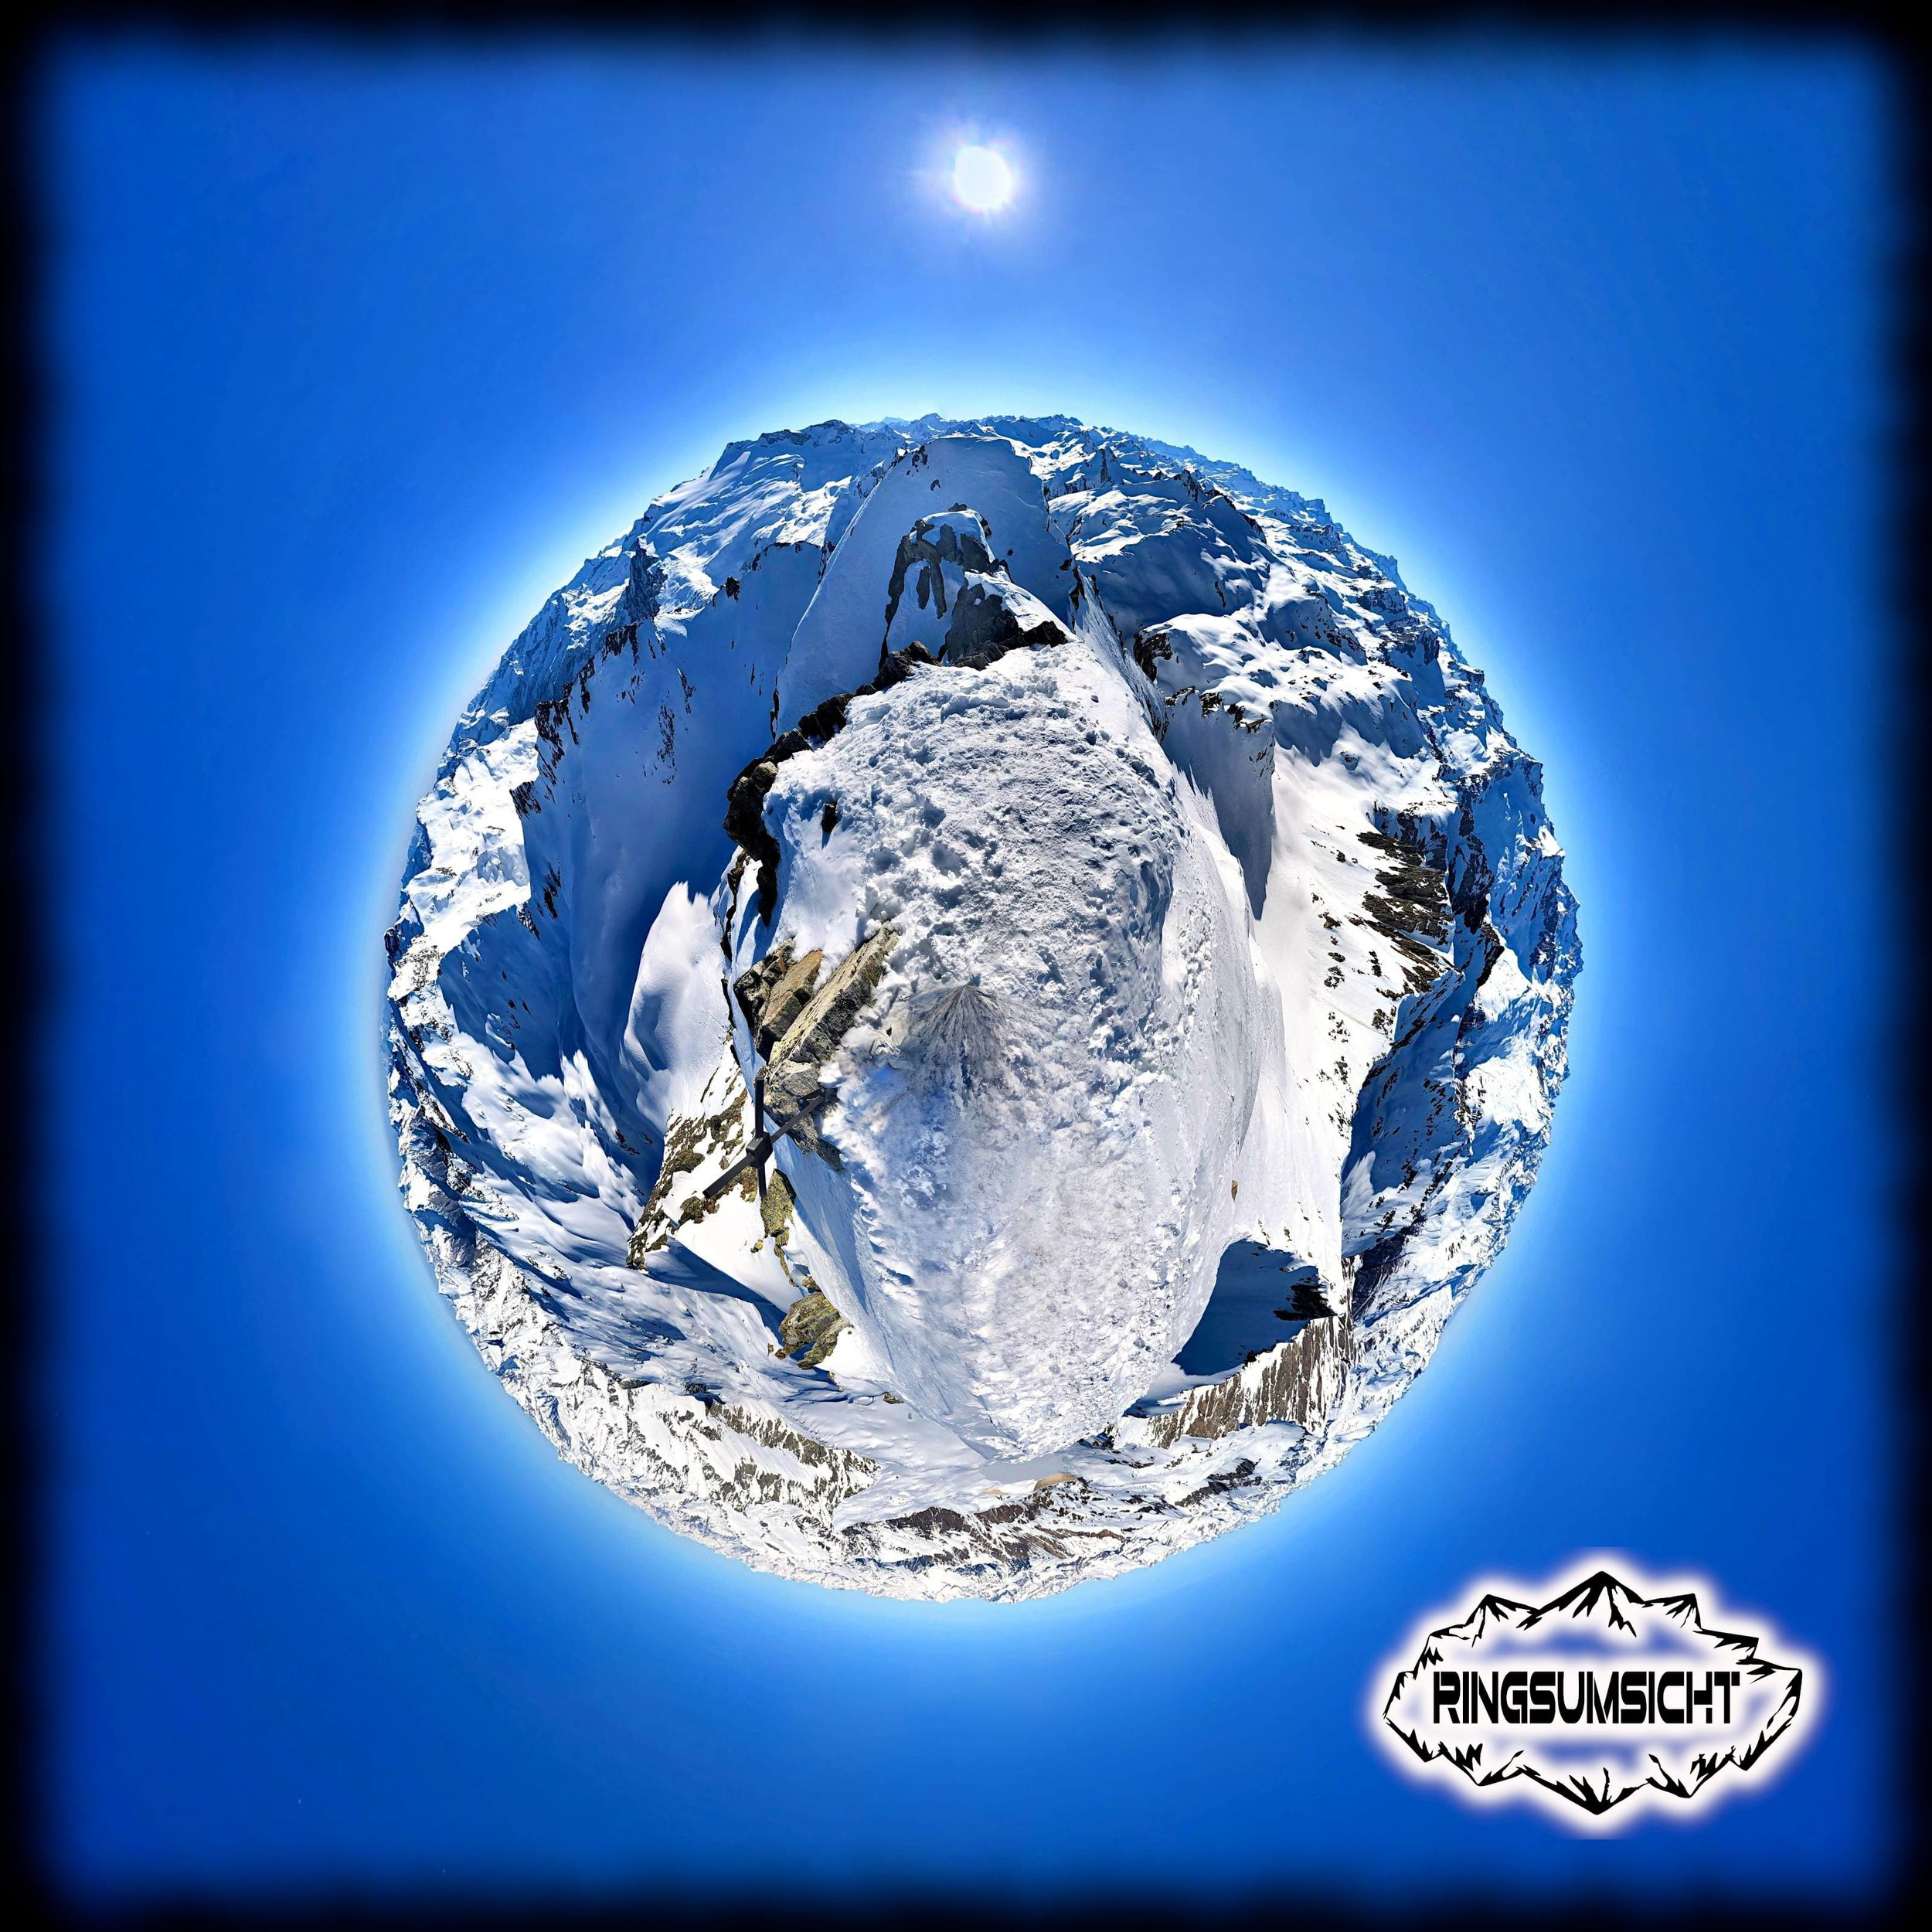 Cristallina Gipfelpanorama